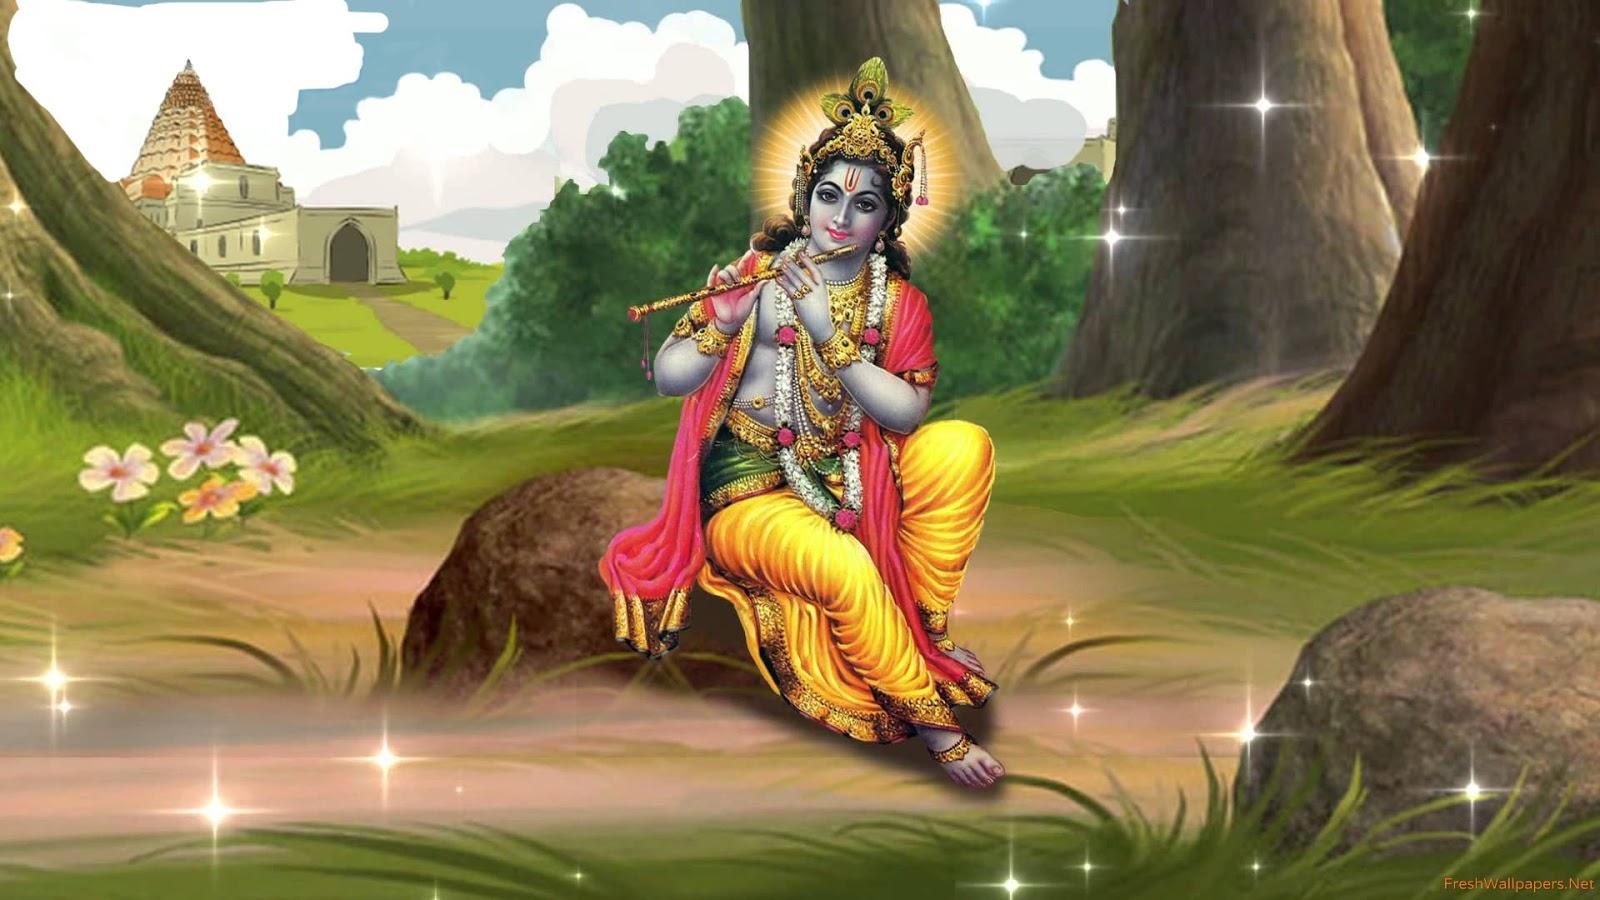 Lord shree bal krishna wallpaper beautiful hd wallpaper - Radhe Krishna Images